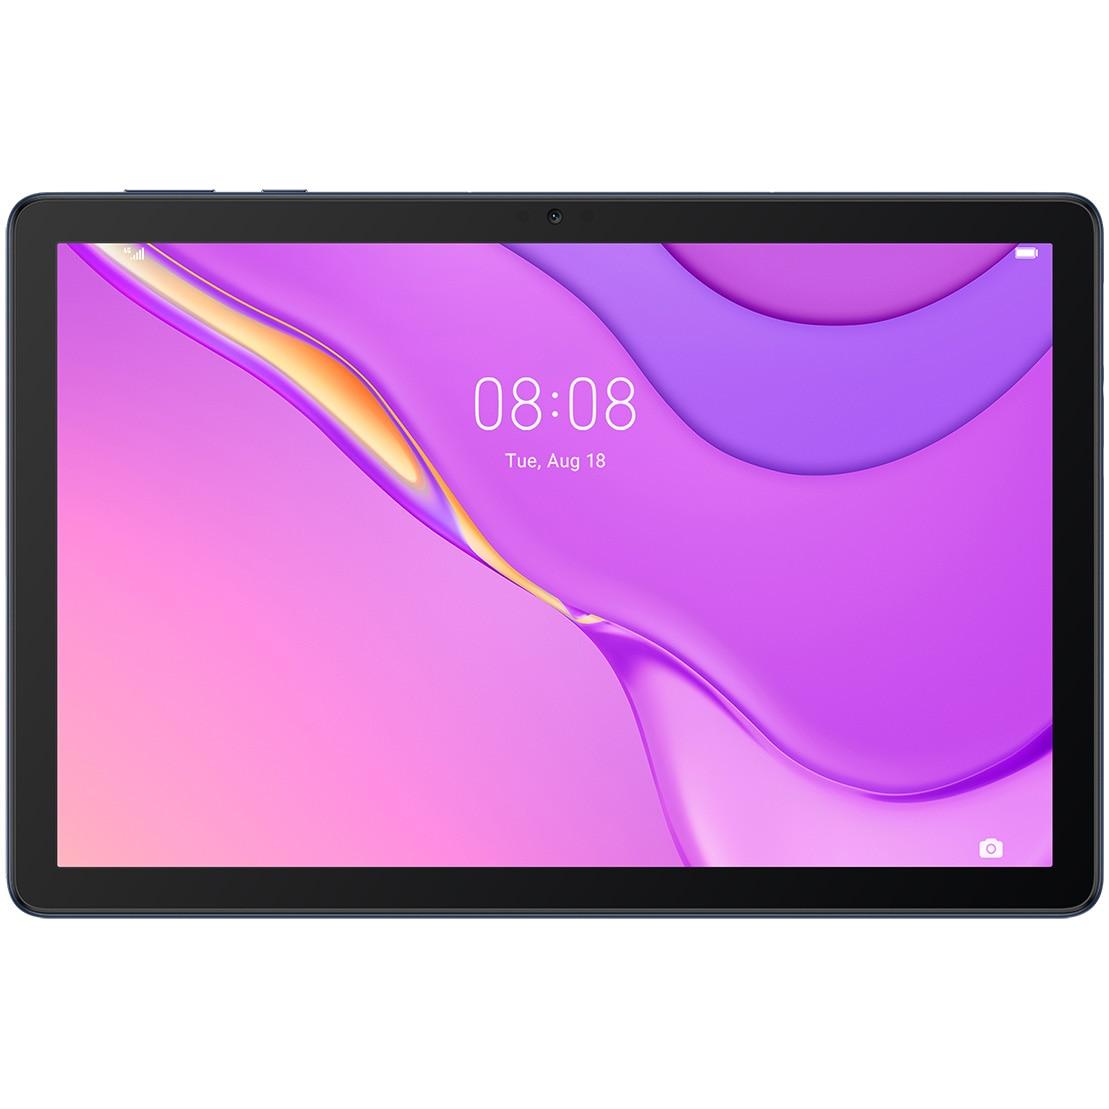 "Fotografie Tableta Huawei MatePad T10s, Octa-Core, 10.1"", 2GB RAM, 32GB, 4G, Deepsea Blue"